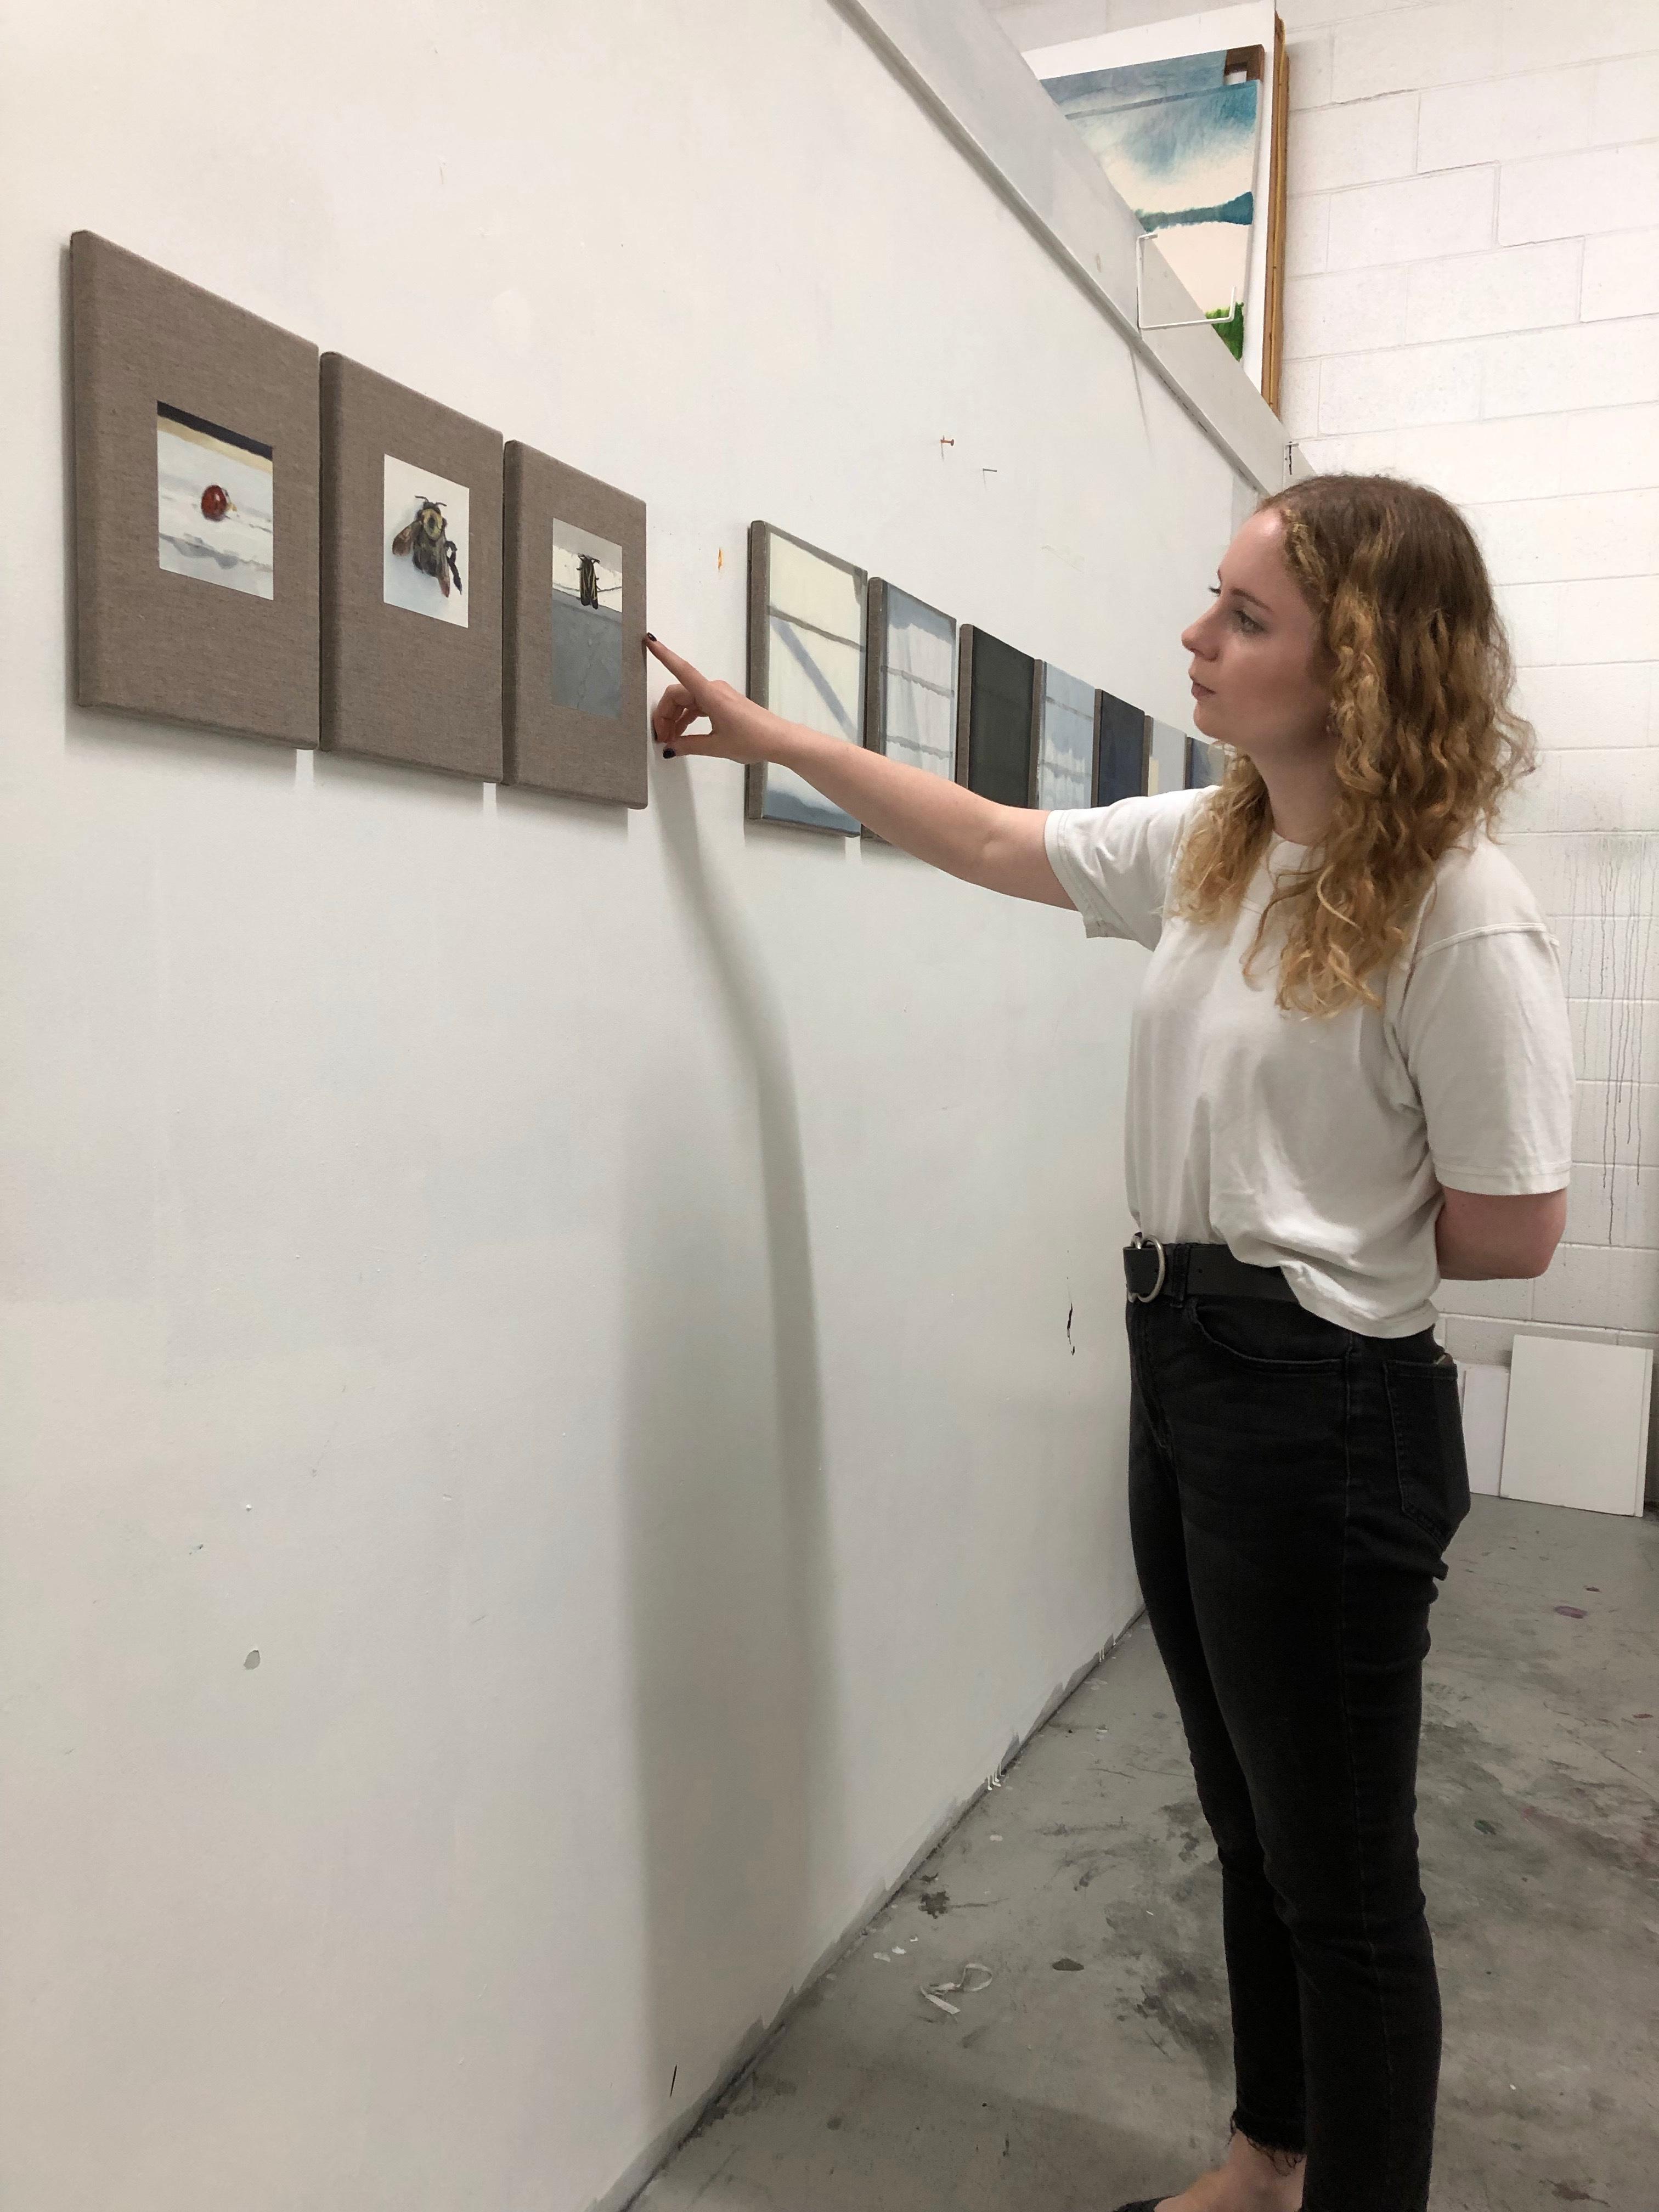 Megan White, Studio Visit, June 2019